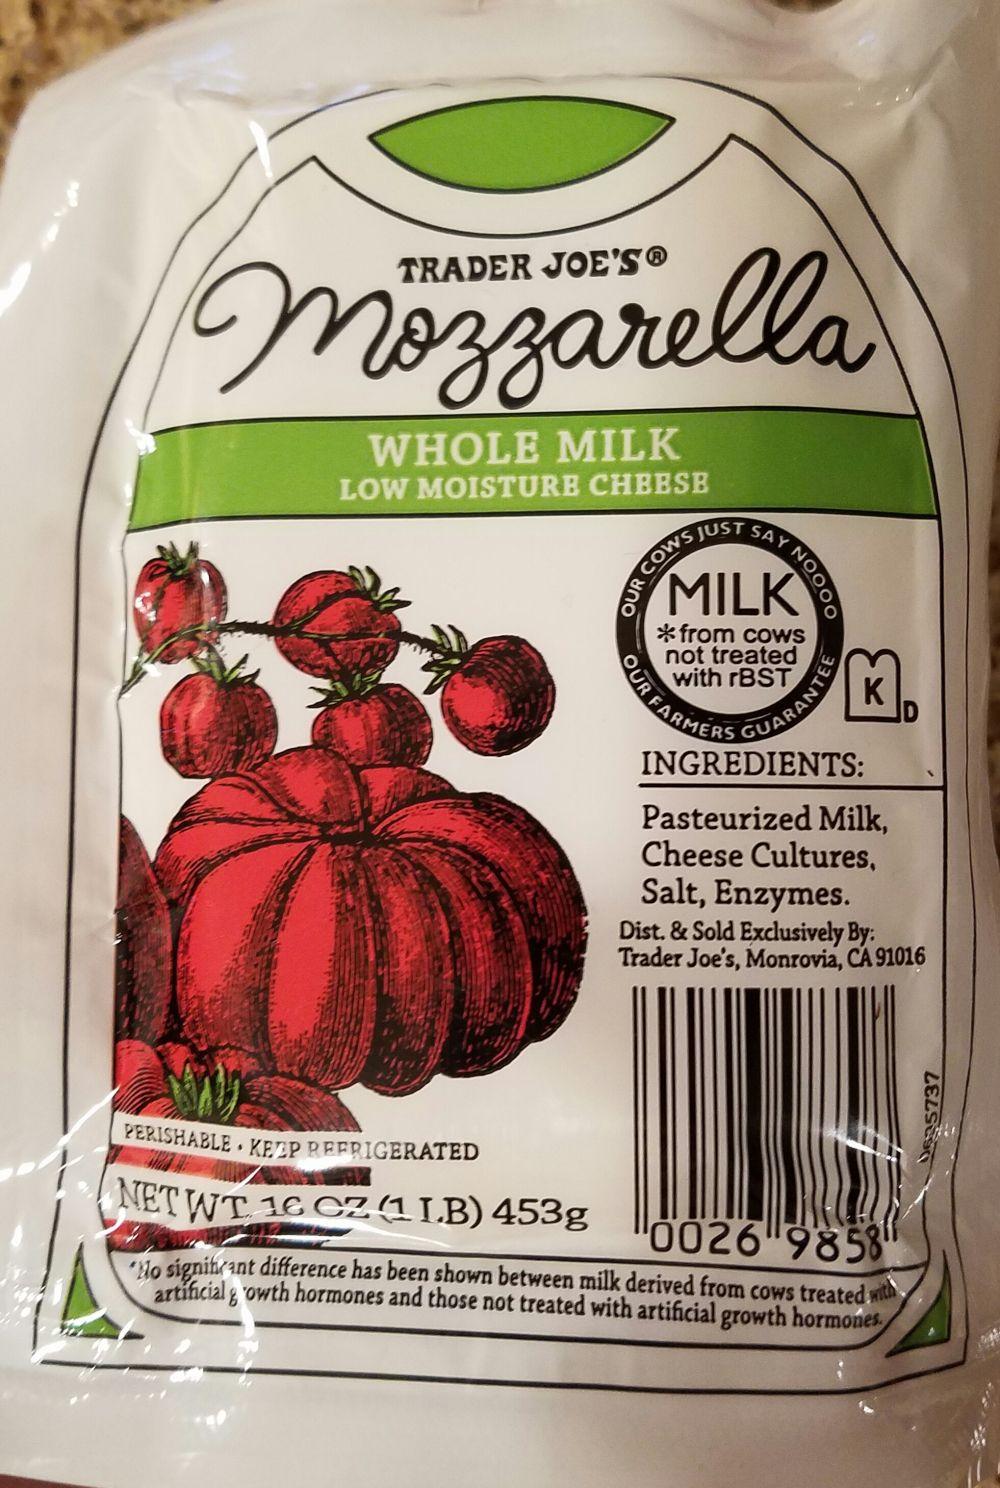 Trader Joe S Mozzarella Whole Milk Low Moisture Cheese Whole Milk Trader Joes Cheese Cultures